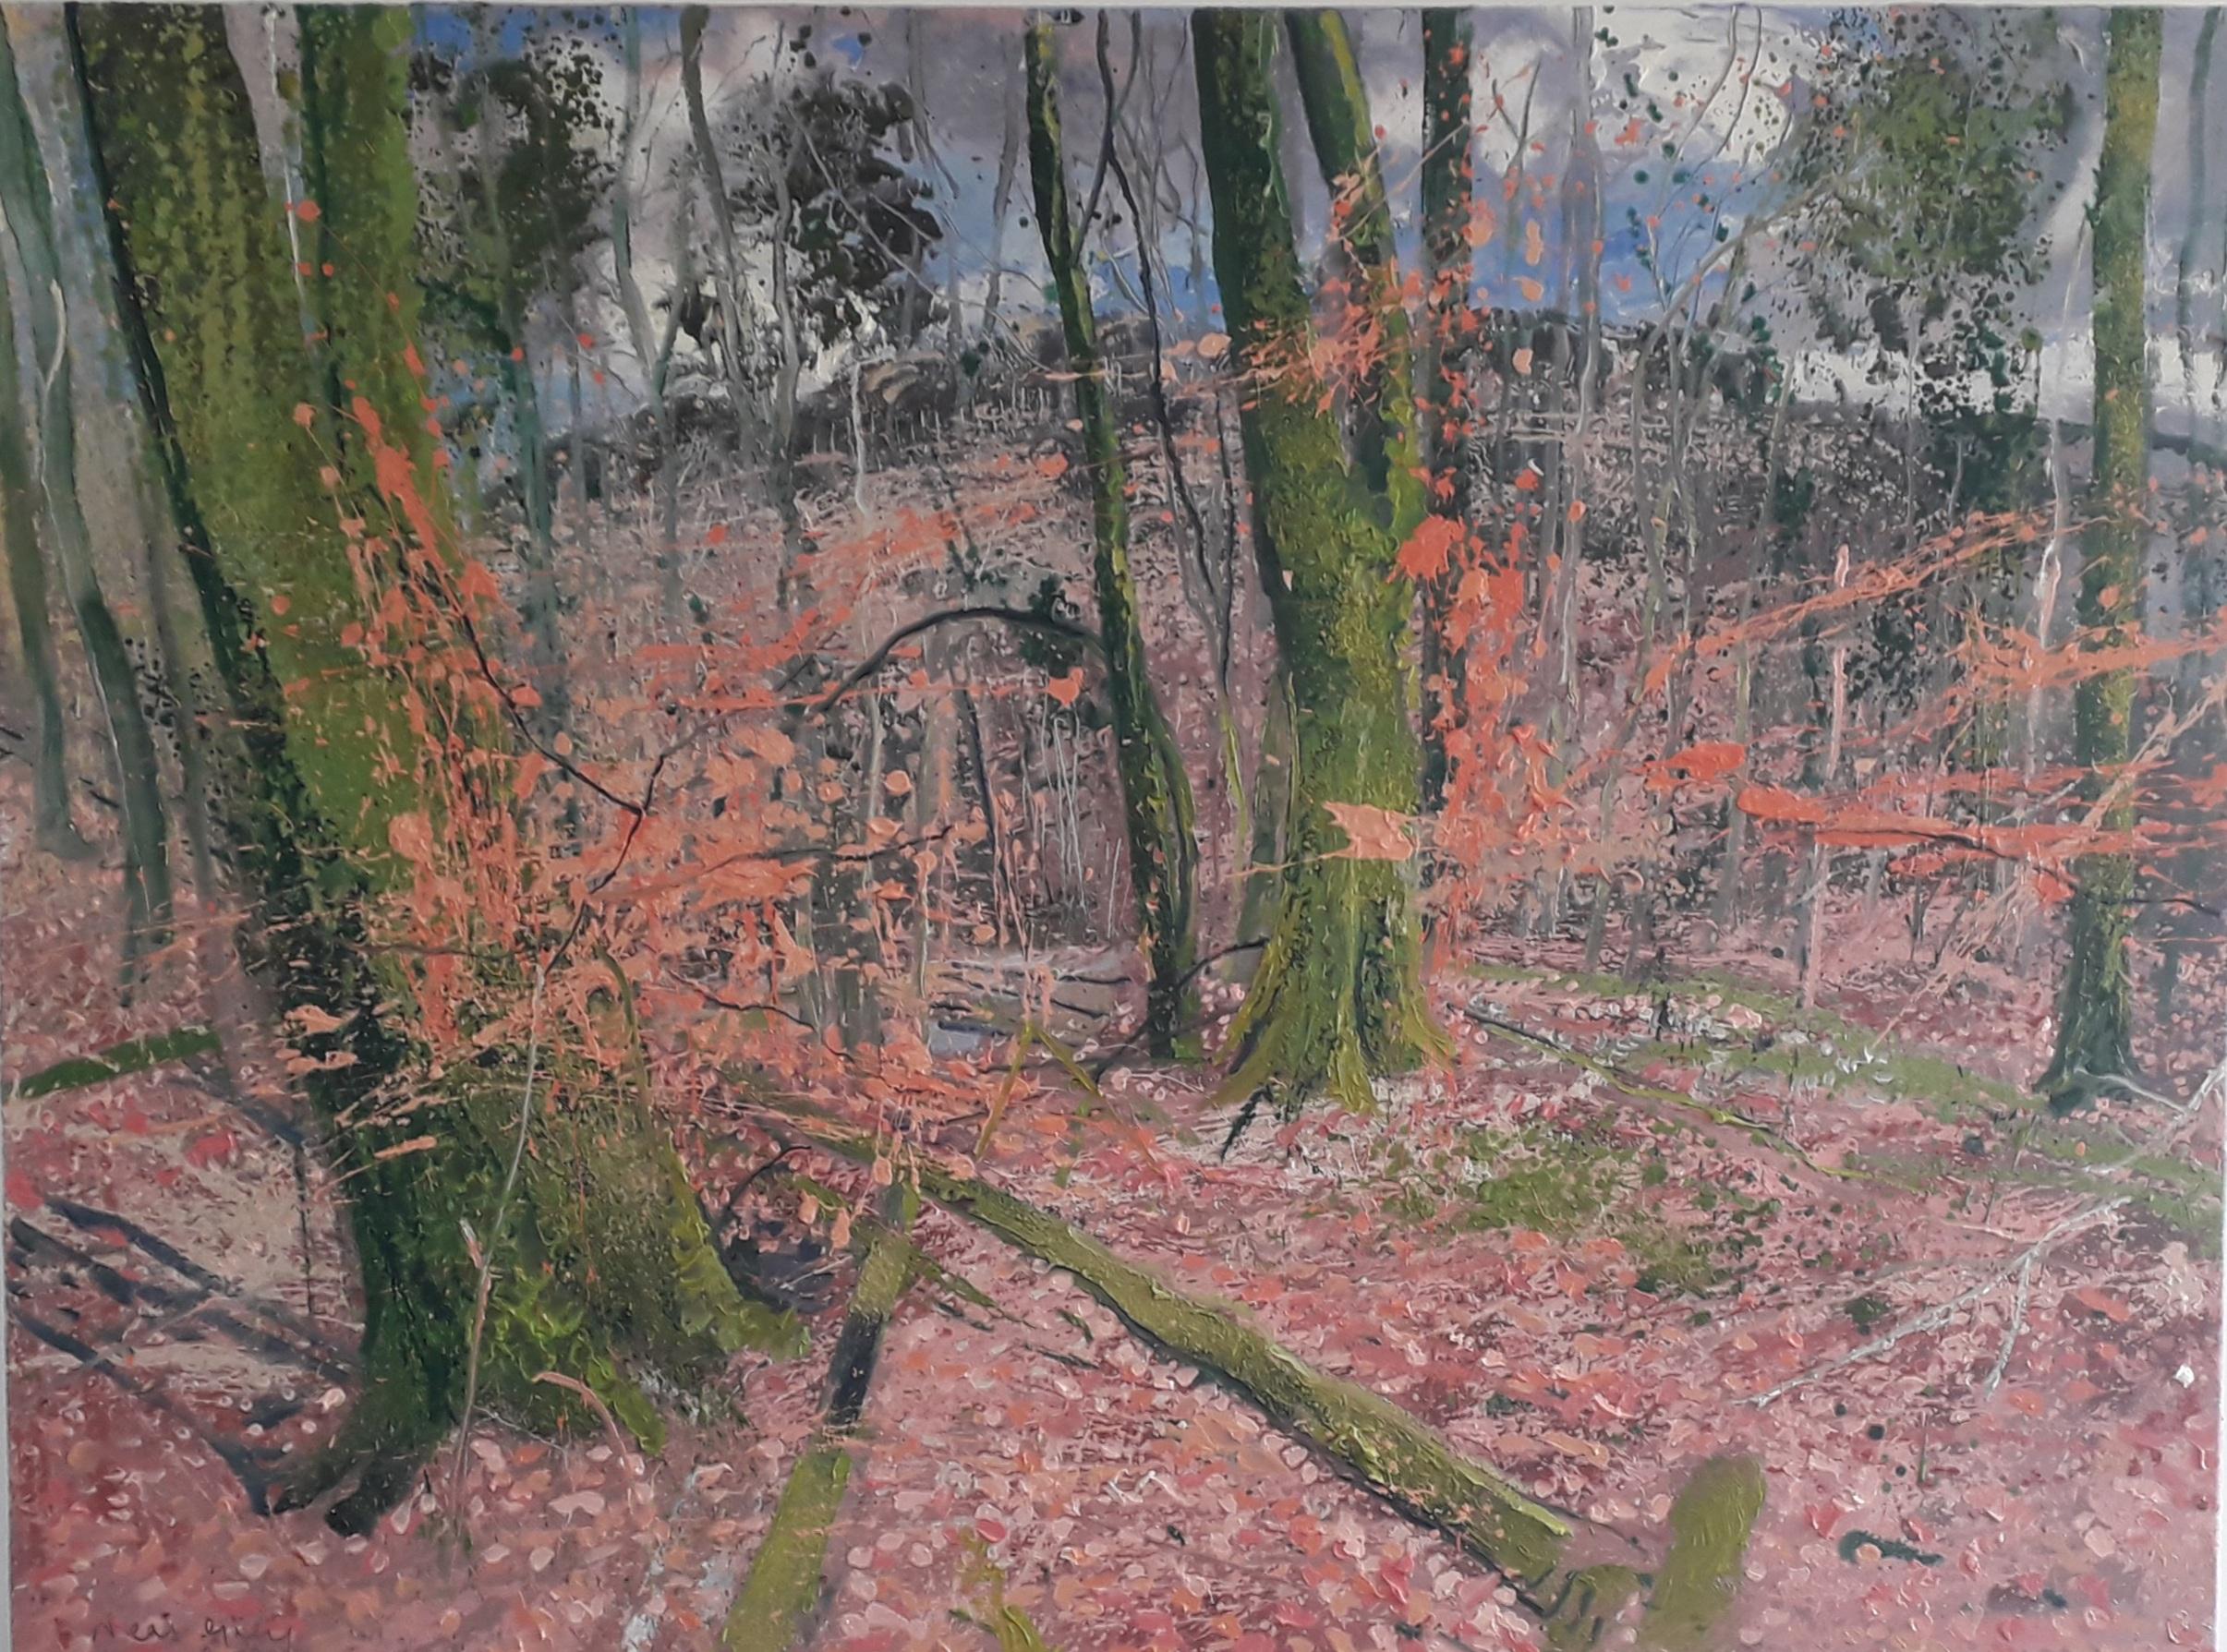 \'Derrygorry Woods\', oil on canvas, 120cm x 90cm, £3300